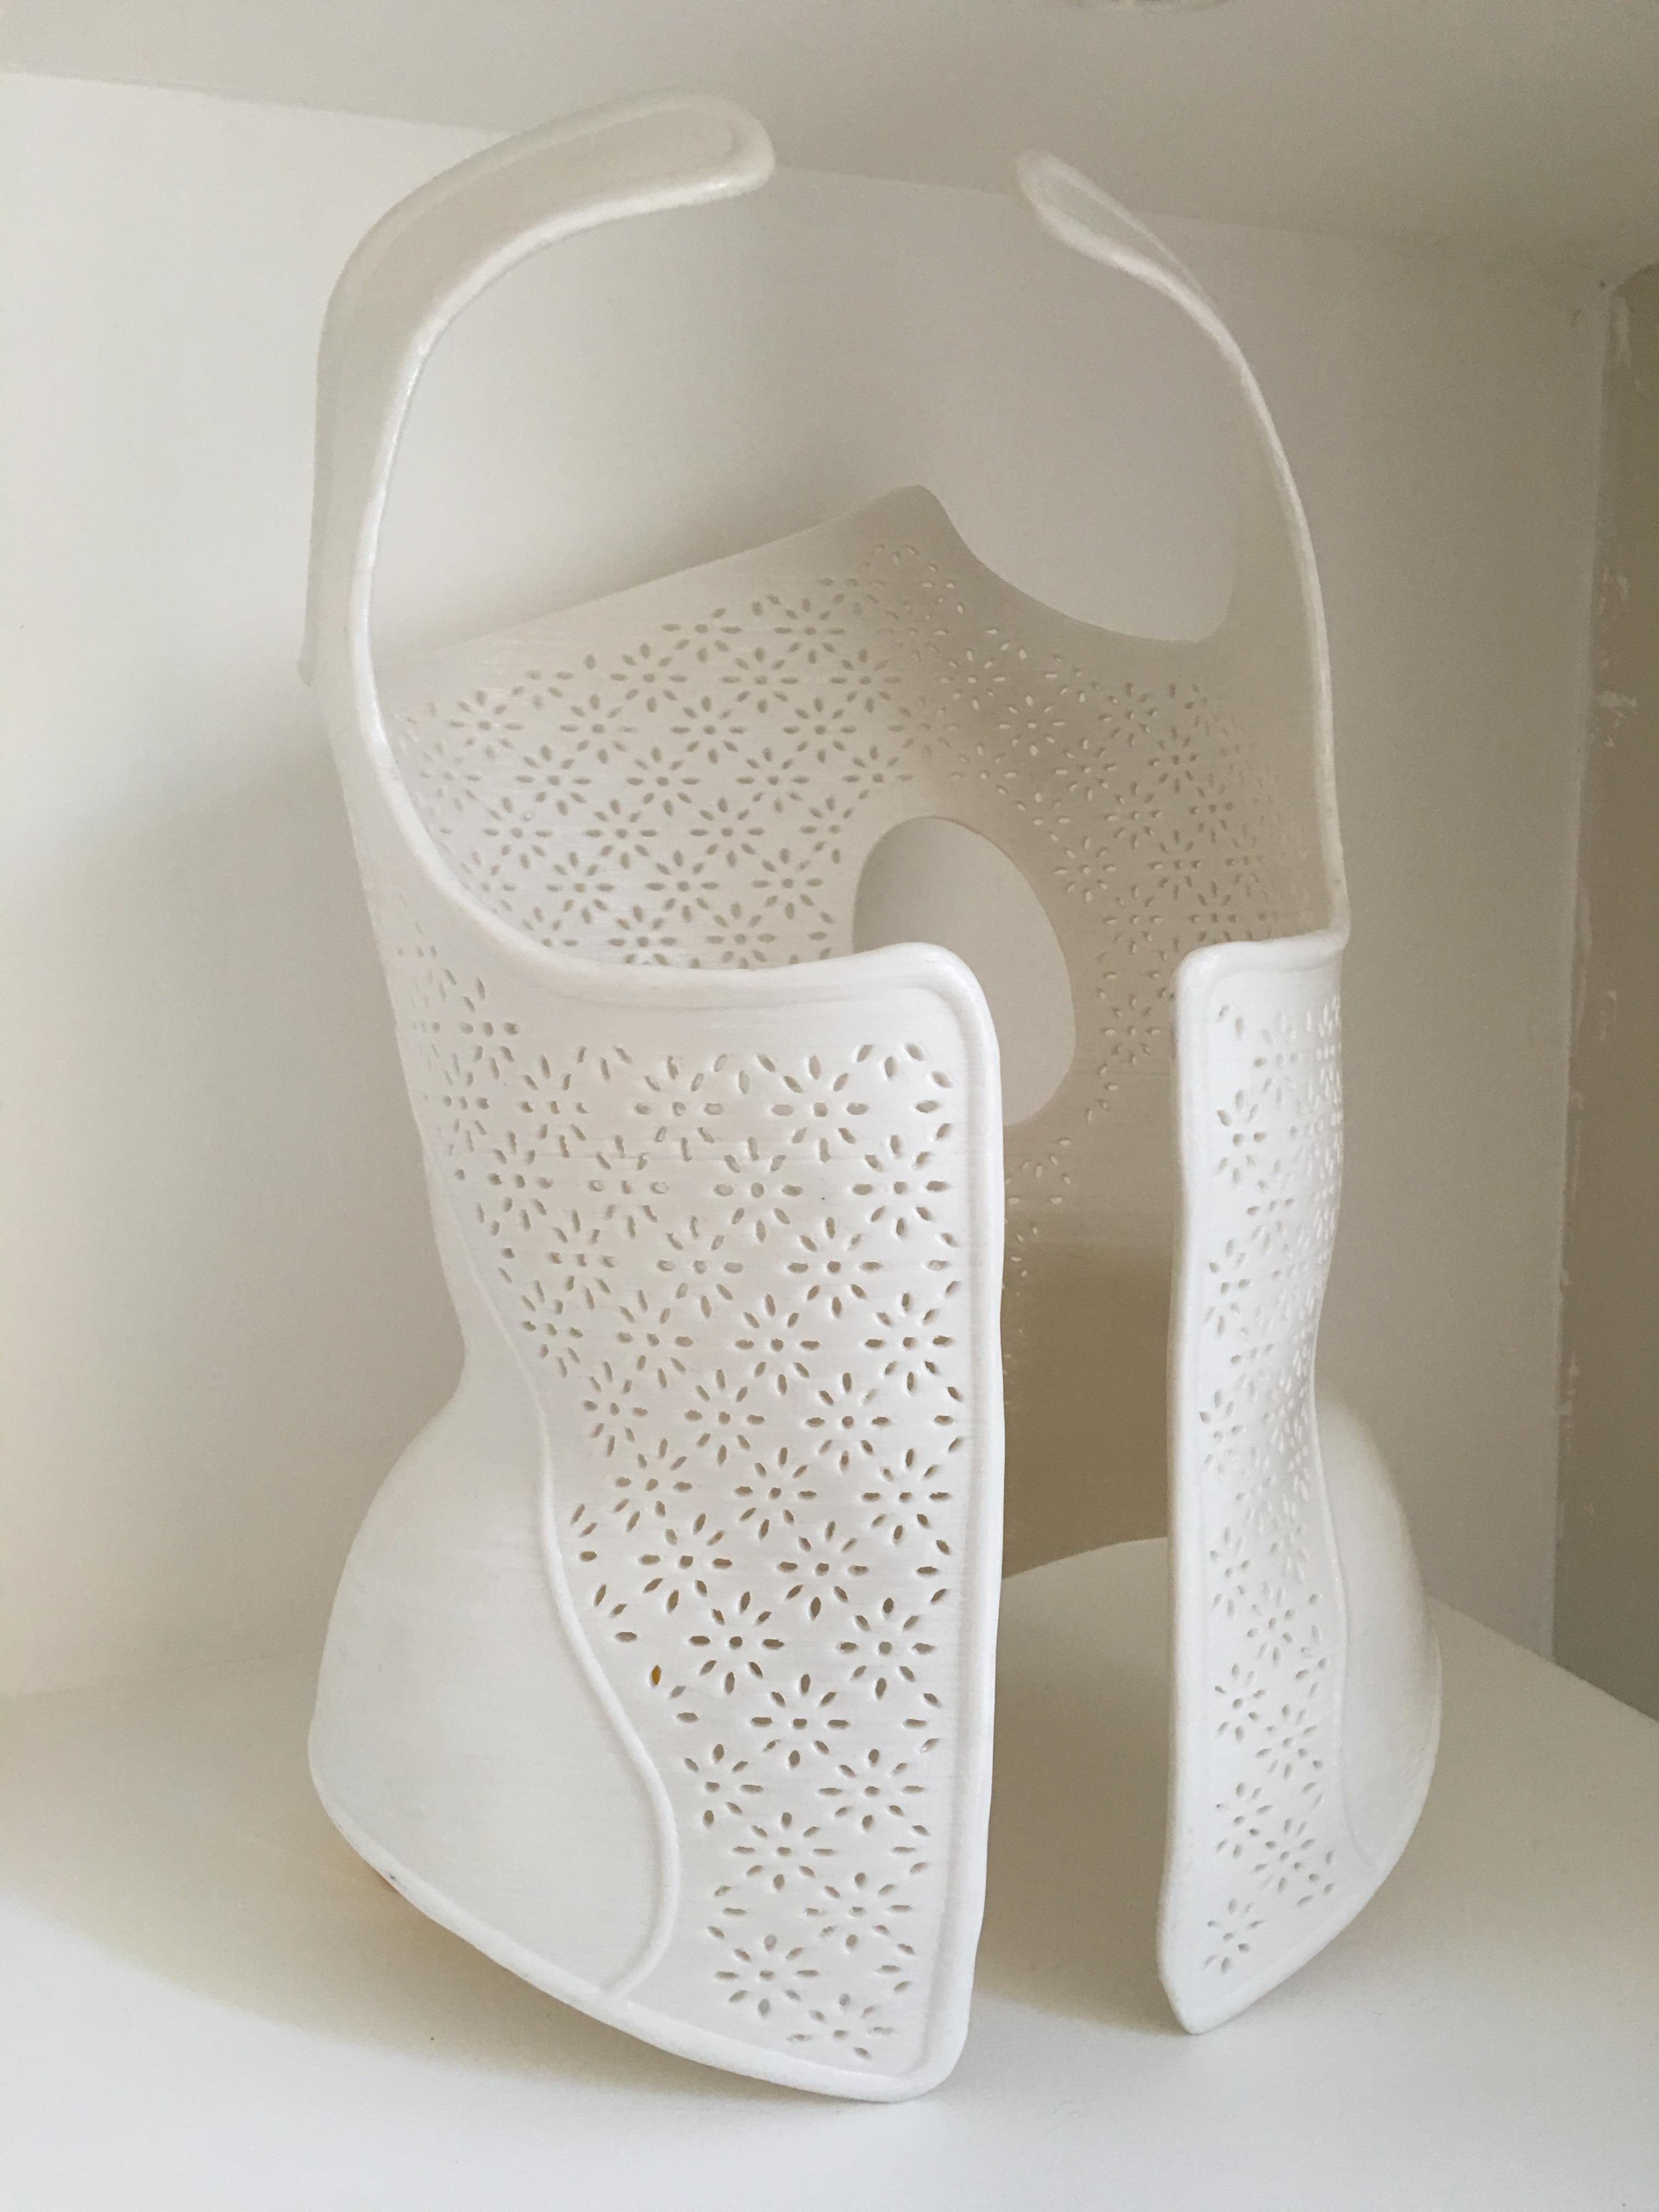 3D printed scoliosis brace